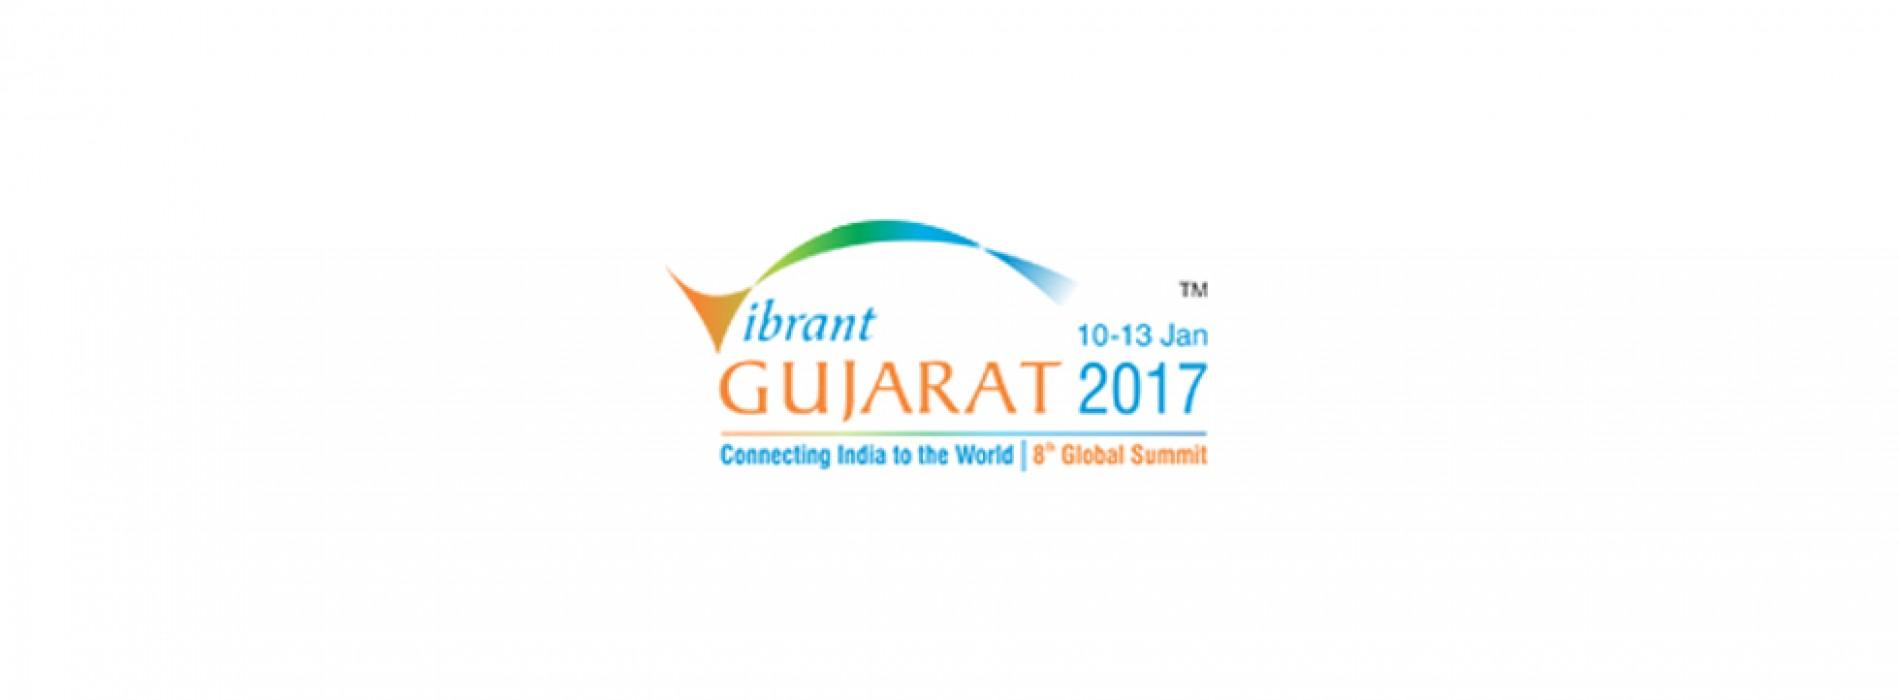 Vibrant Gujarat attendees to enjoy 5%-10% off on airfares